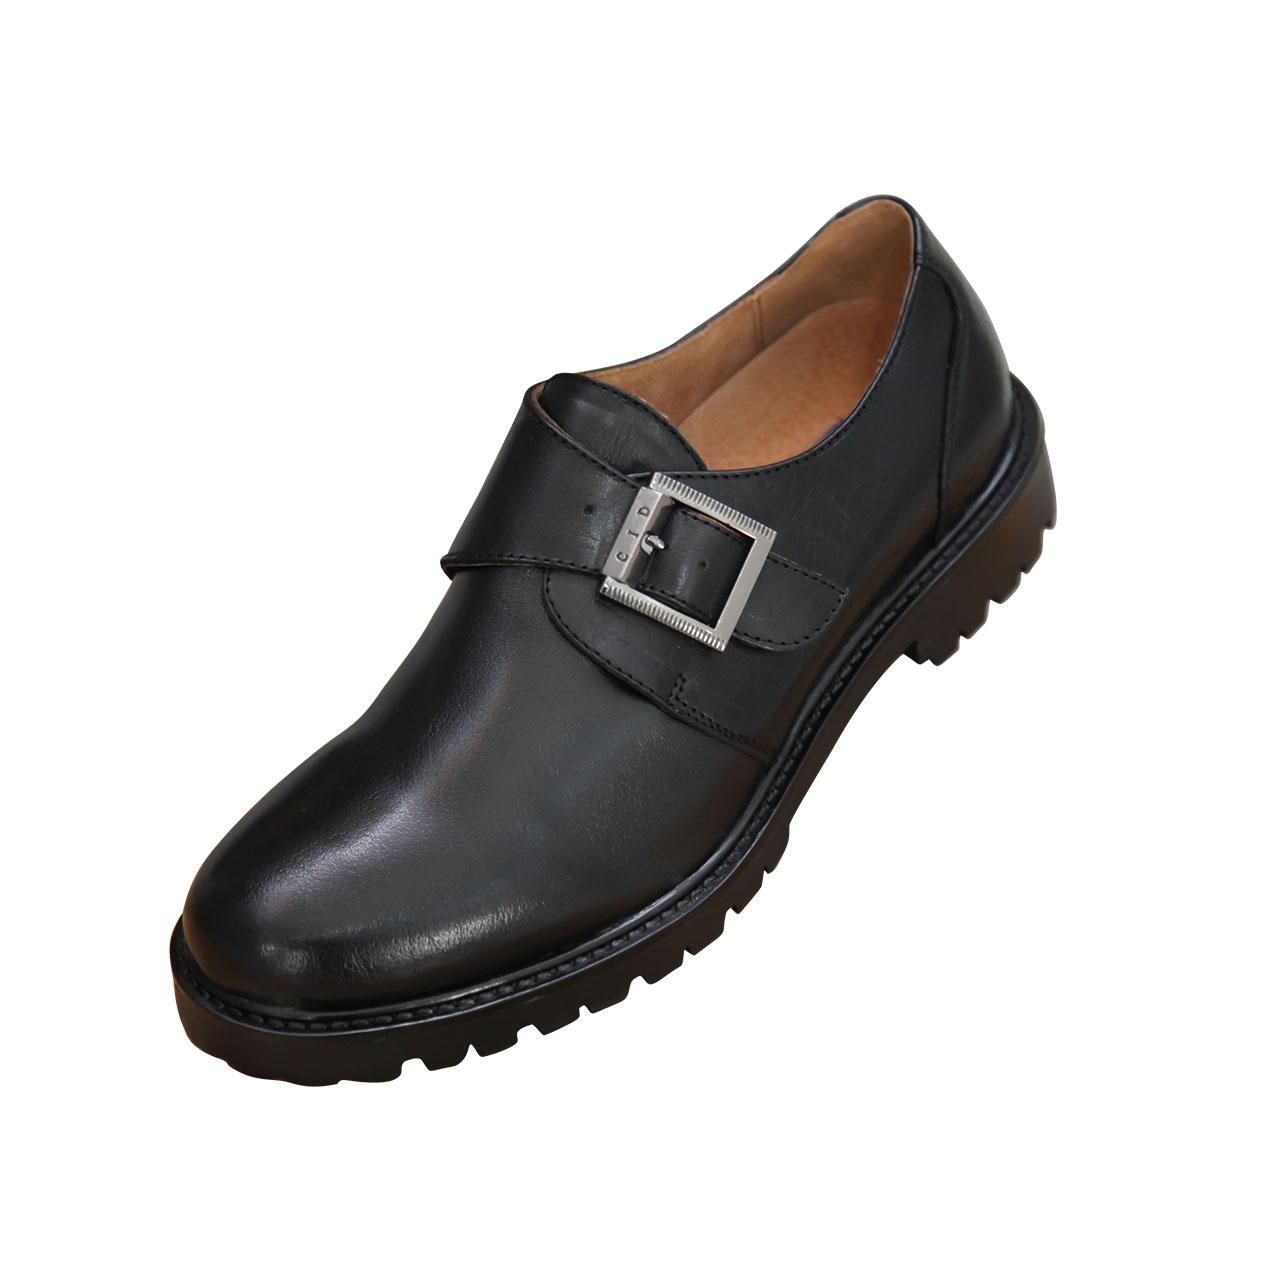 Men's Office Single Monk Strap Genuine Leather Closed Toe Black Shoes